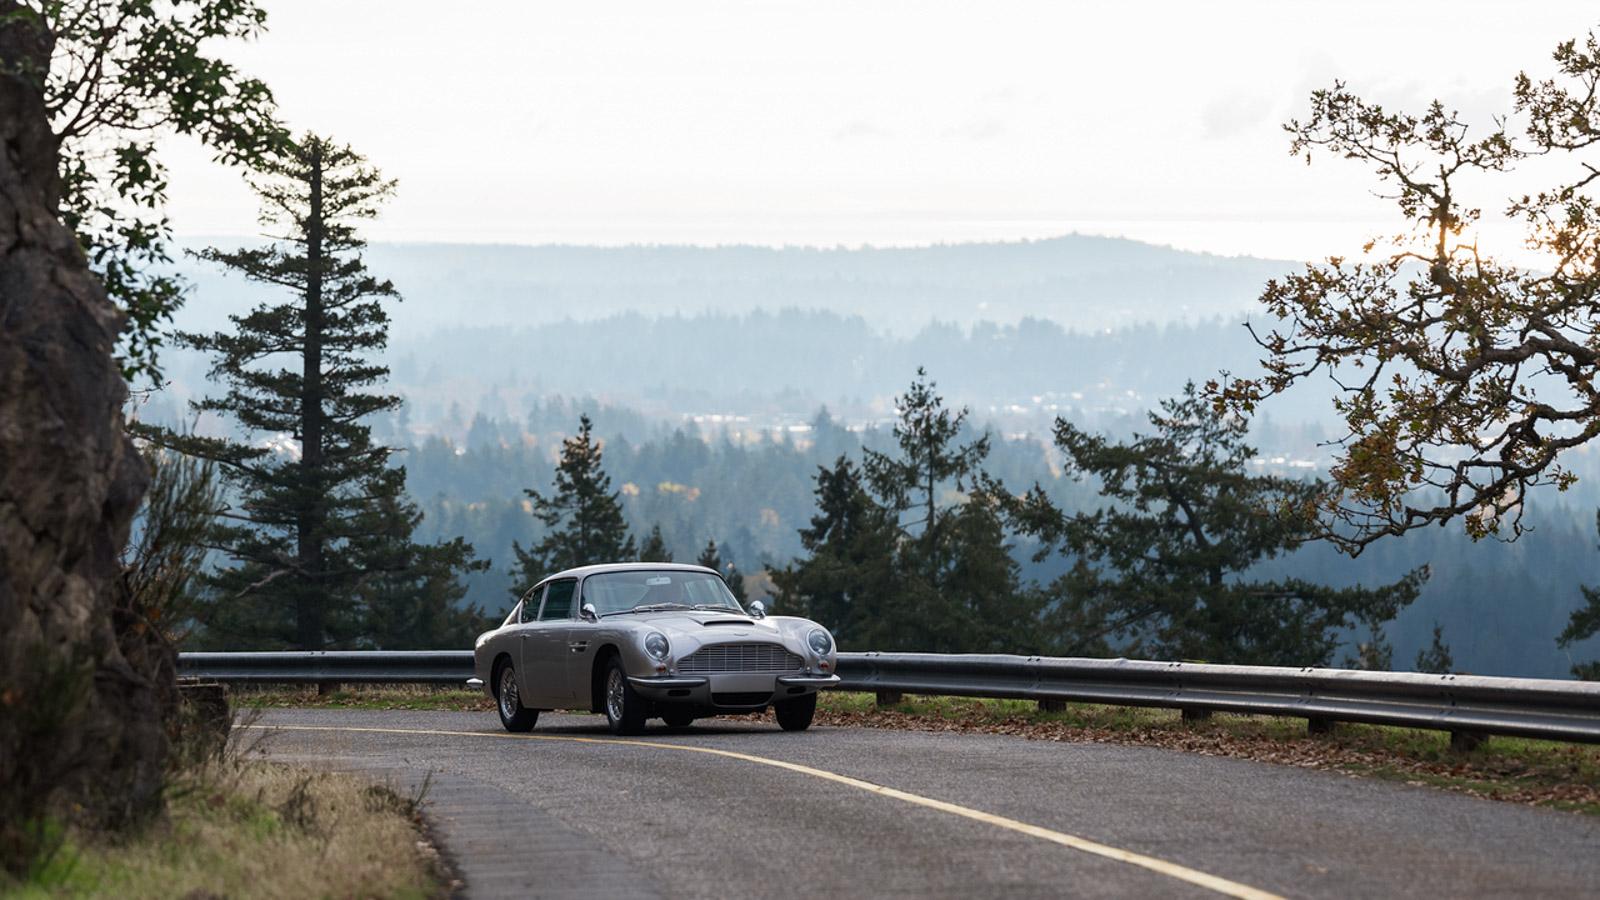 Aston Martin DB6 Coachwerks automobile restoration